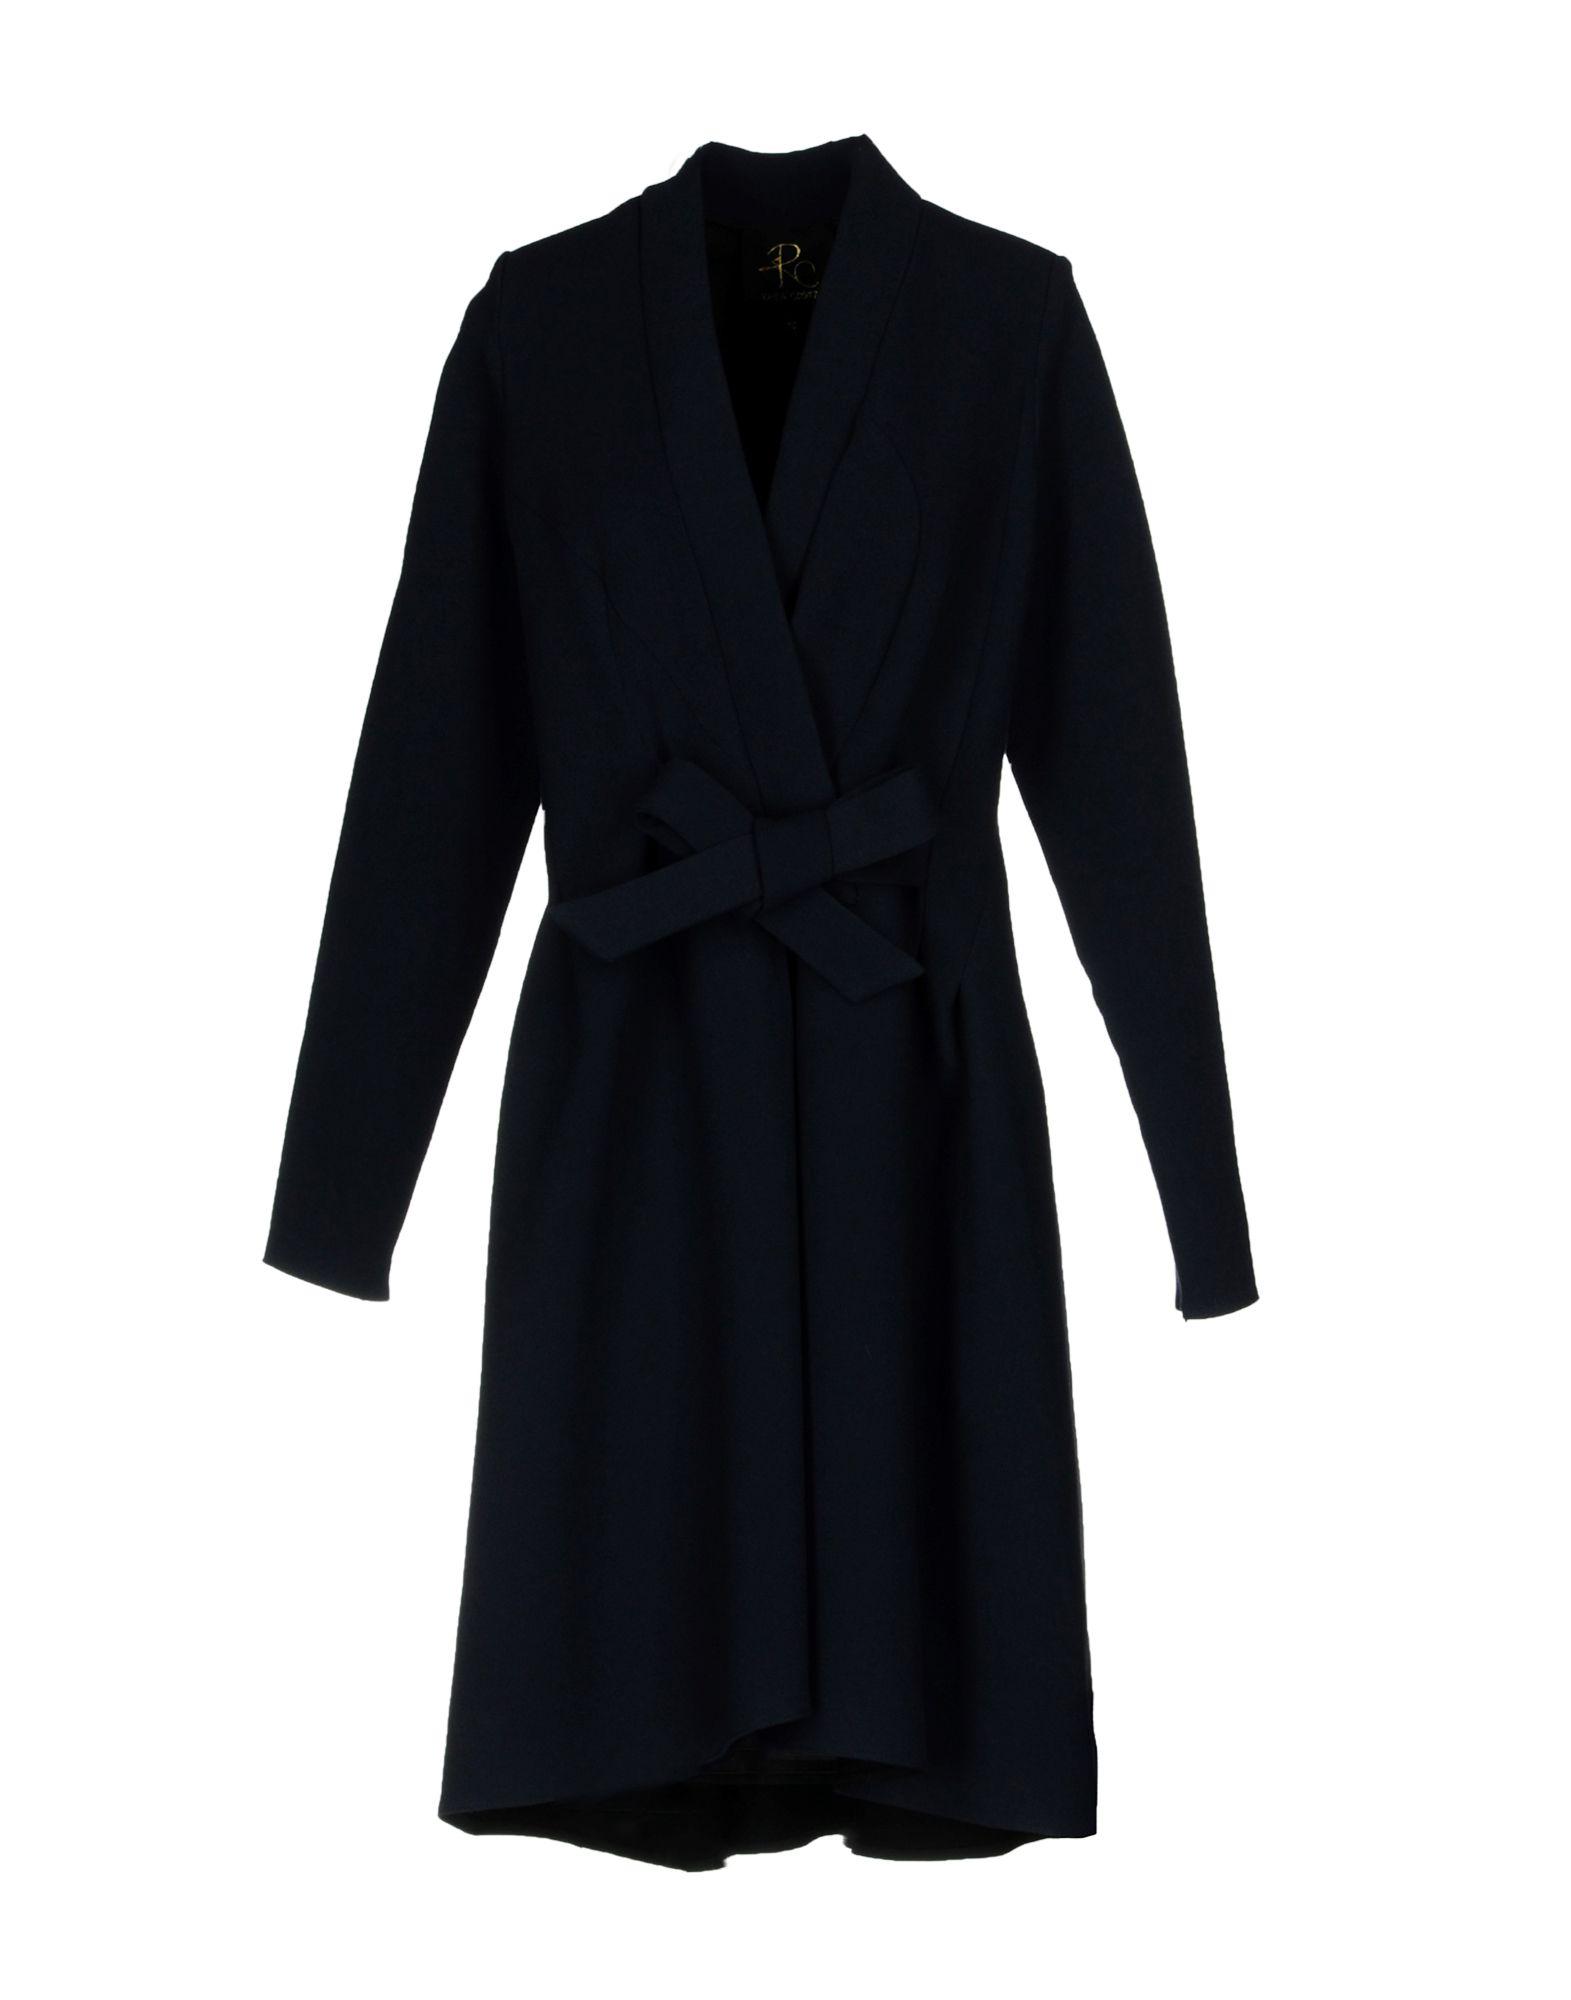 RHEA COSTA Coat in Dark Blue